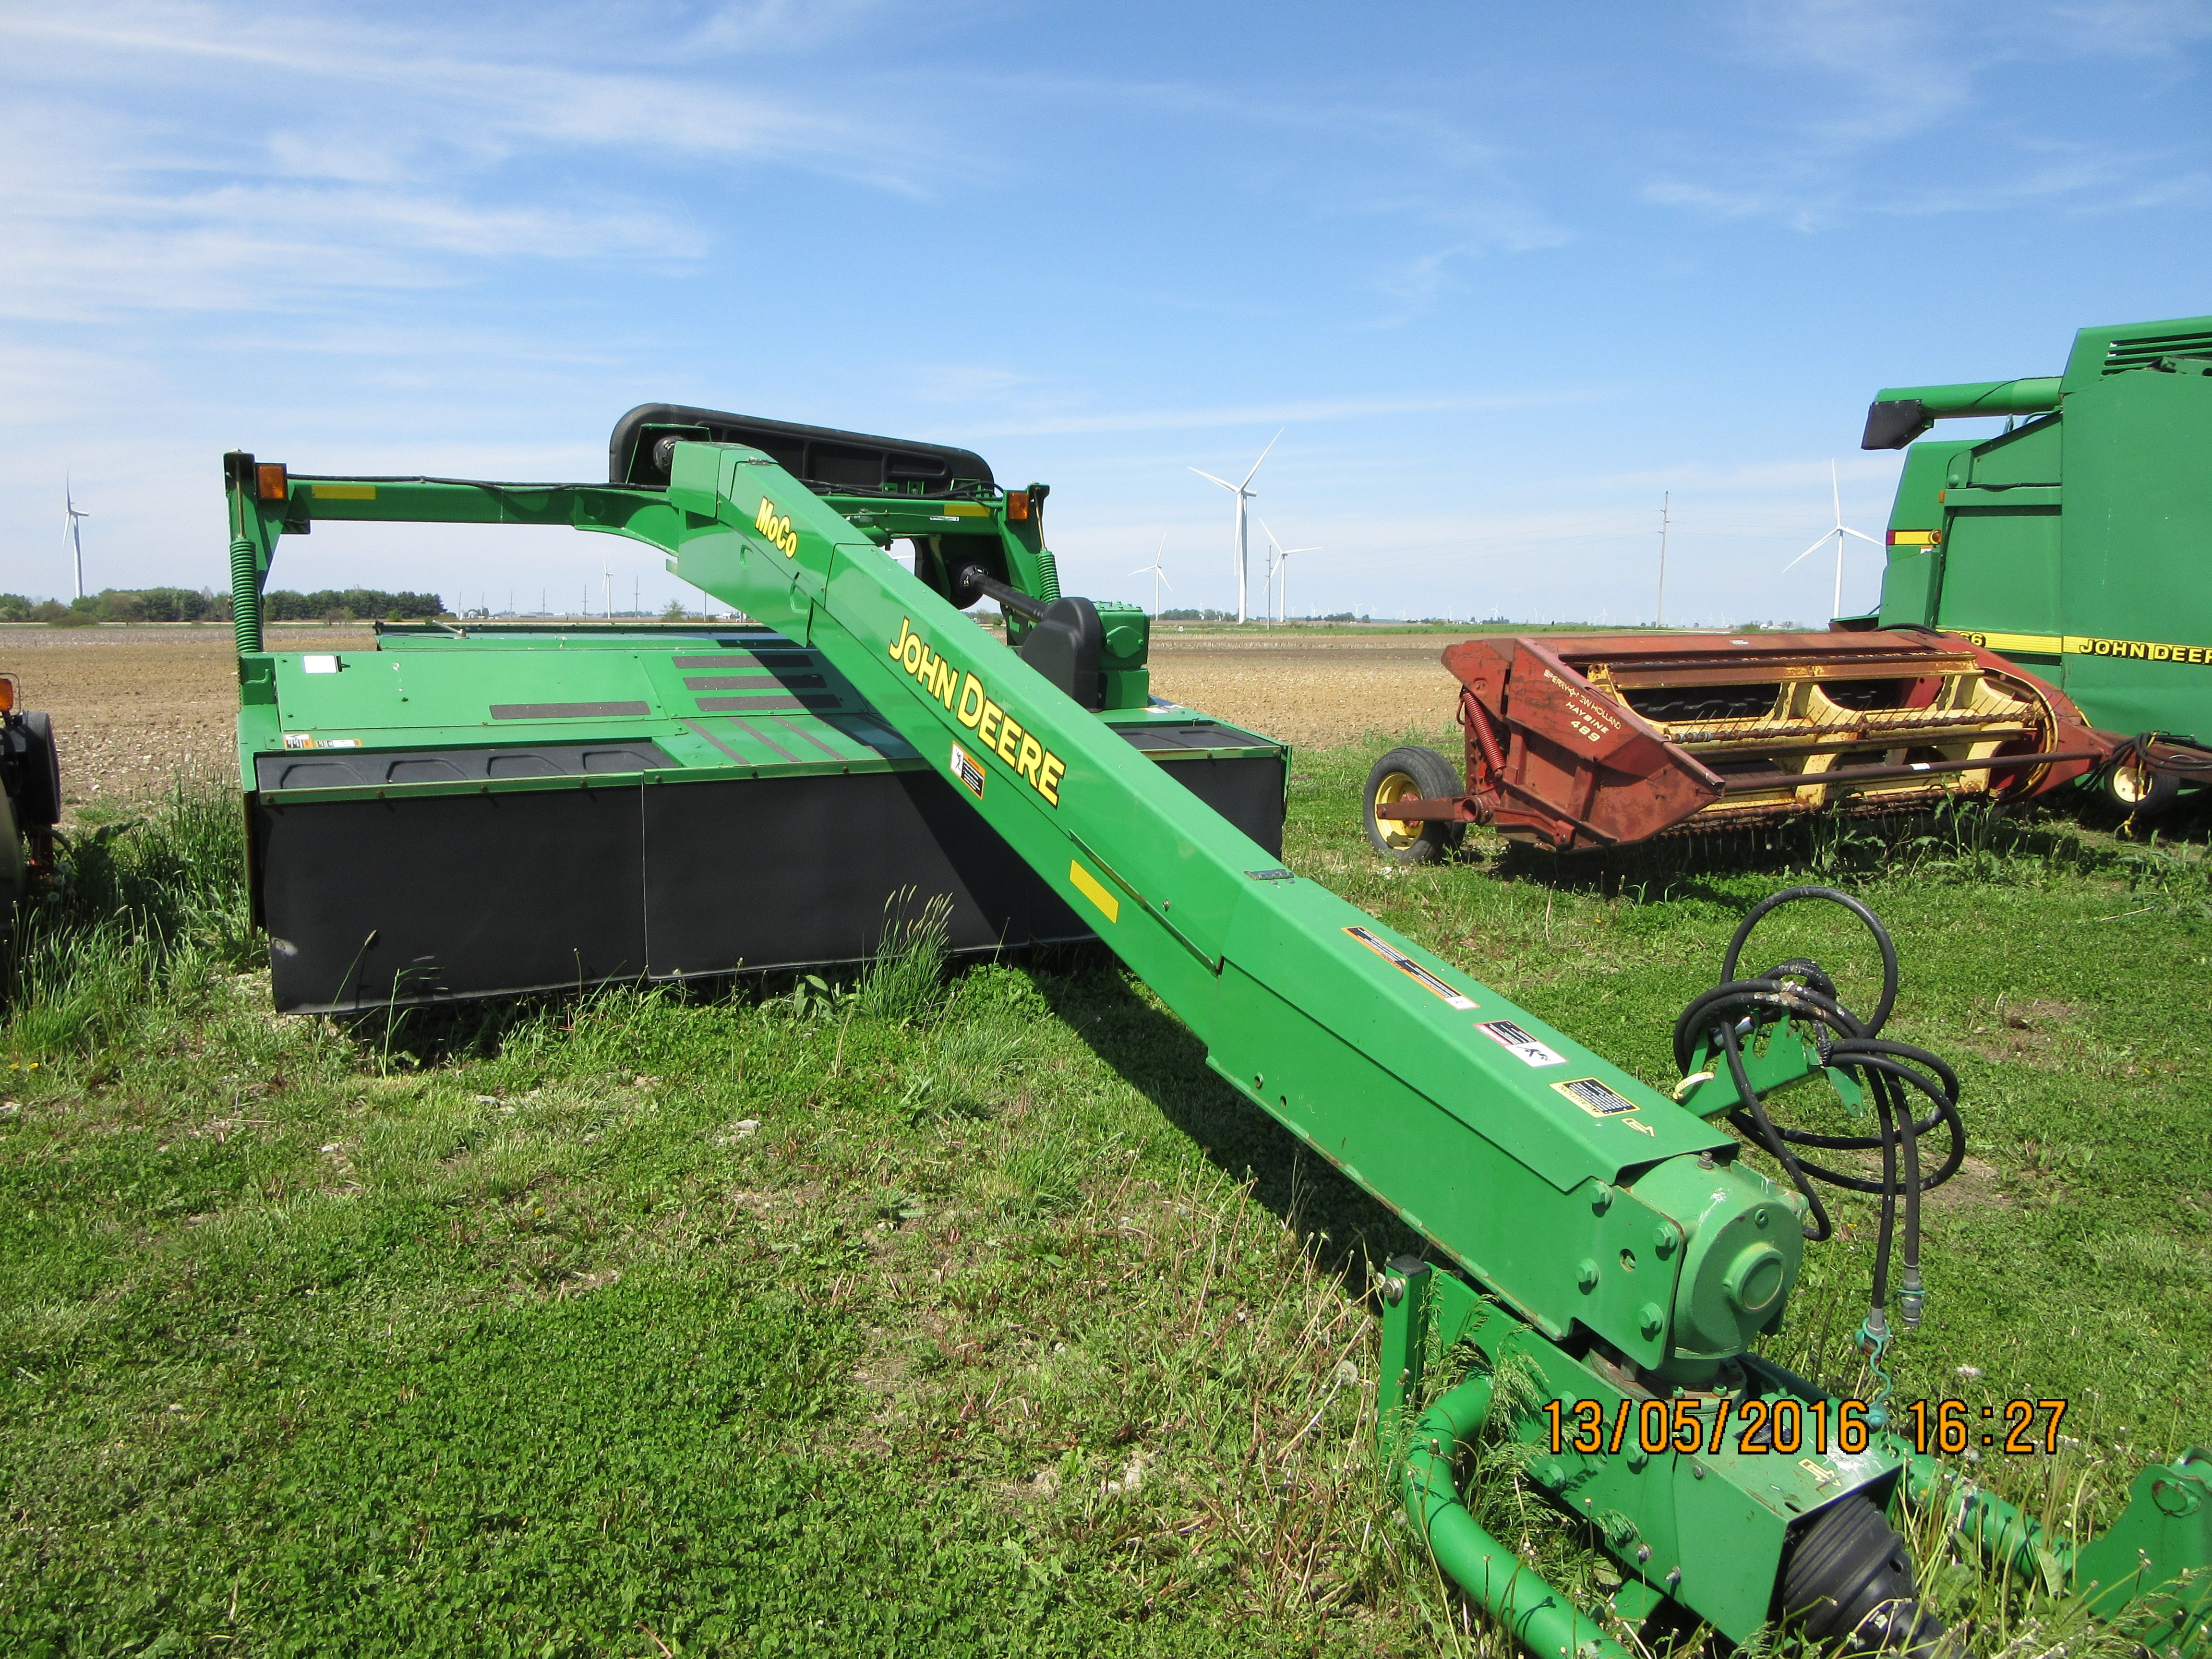 John Deere 730 mo/co mower conditioner | Tractors and